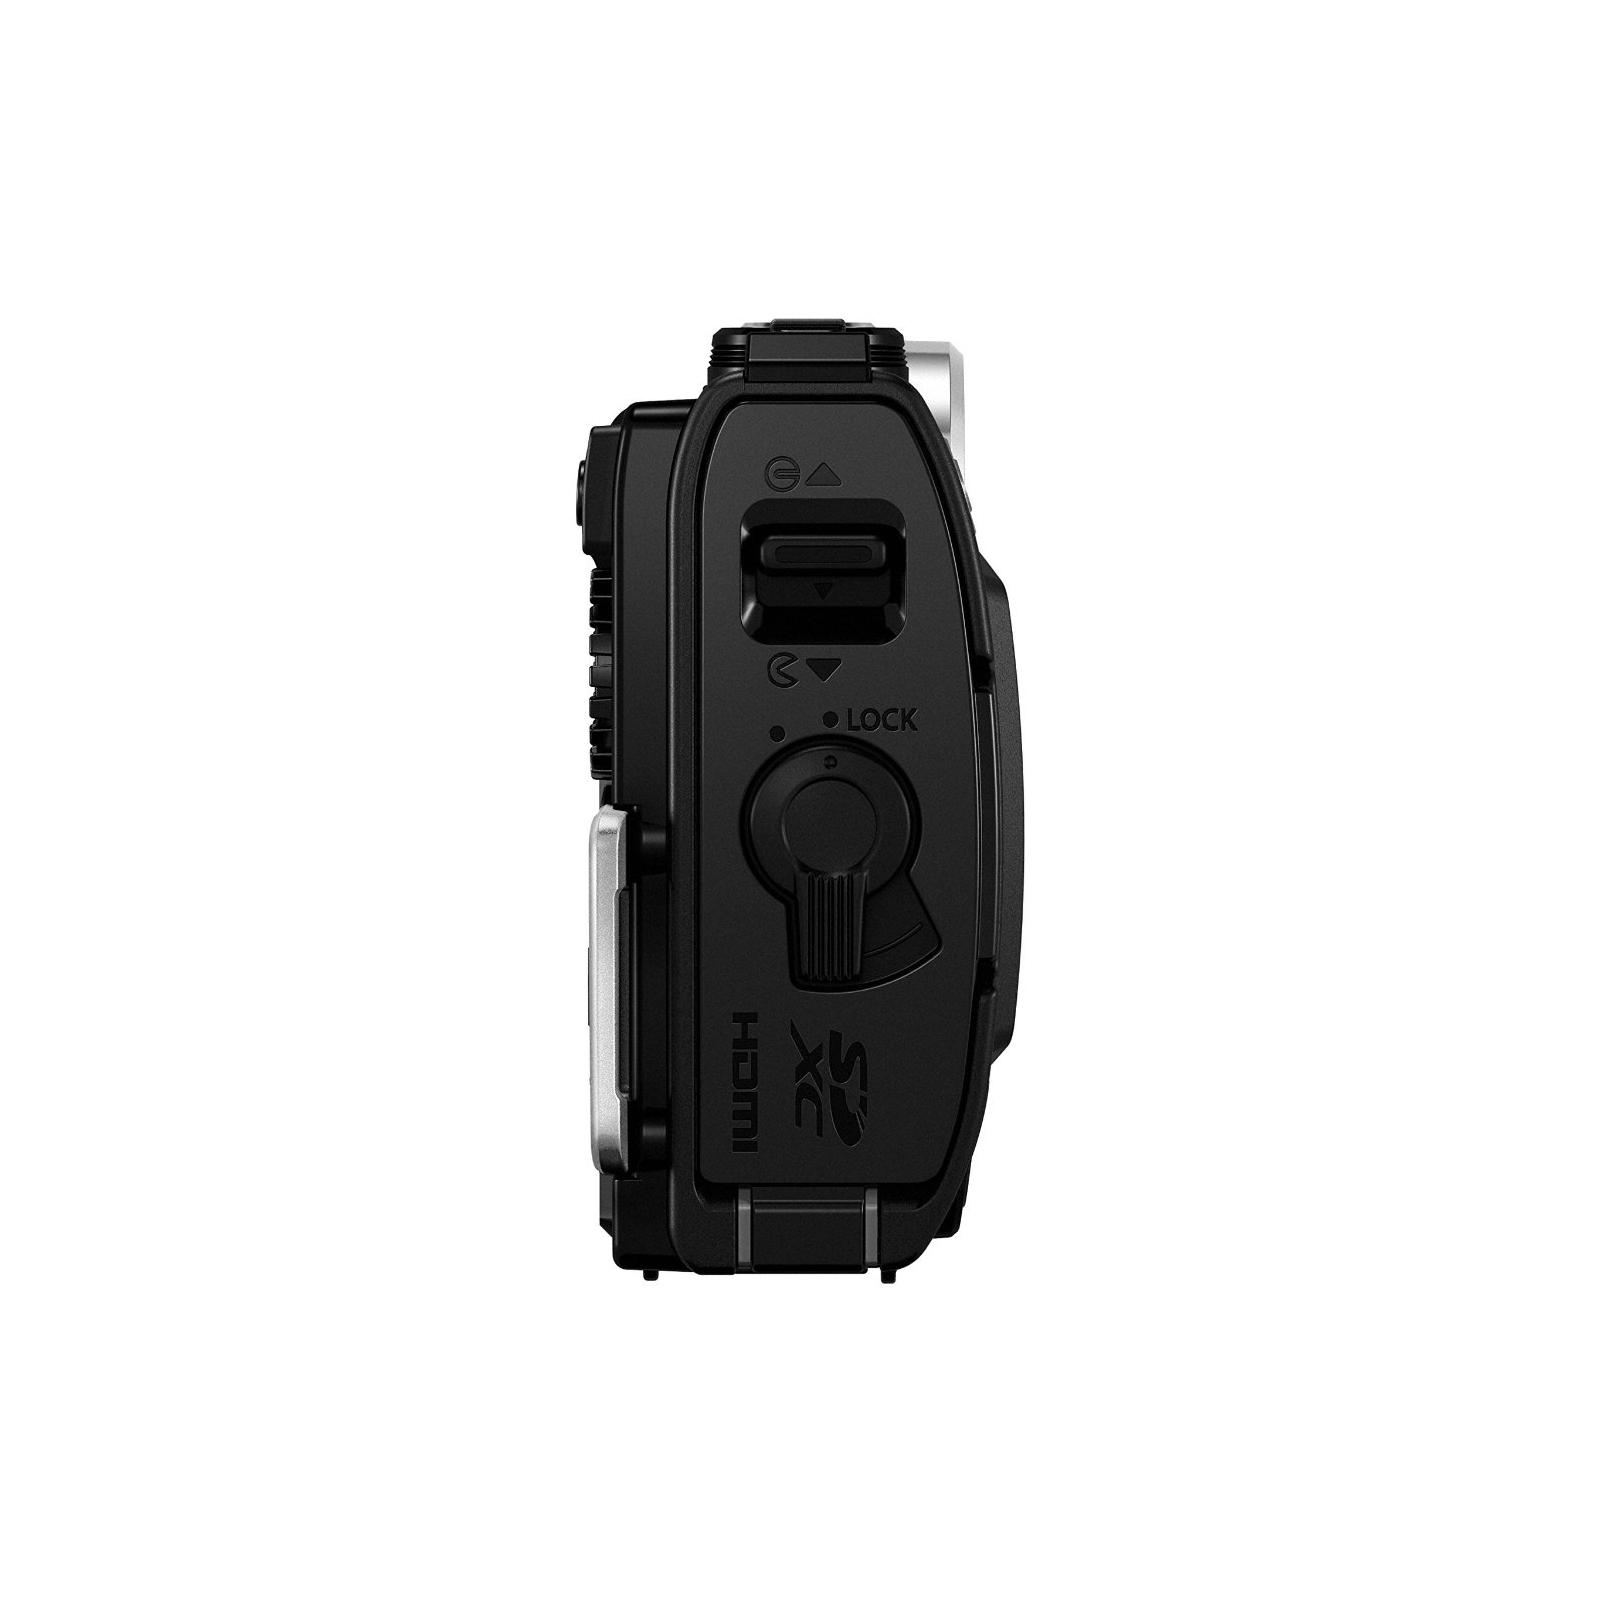 Цифровой фотоаппарат OLYMPUS TG-860 Orange (Waterproof - 15m; iHS; Wi-Fi) (V104170OE000) изображение 10